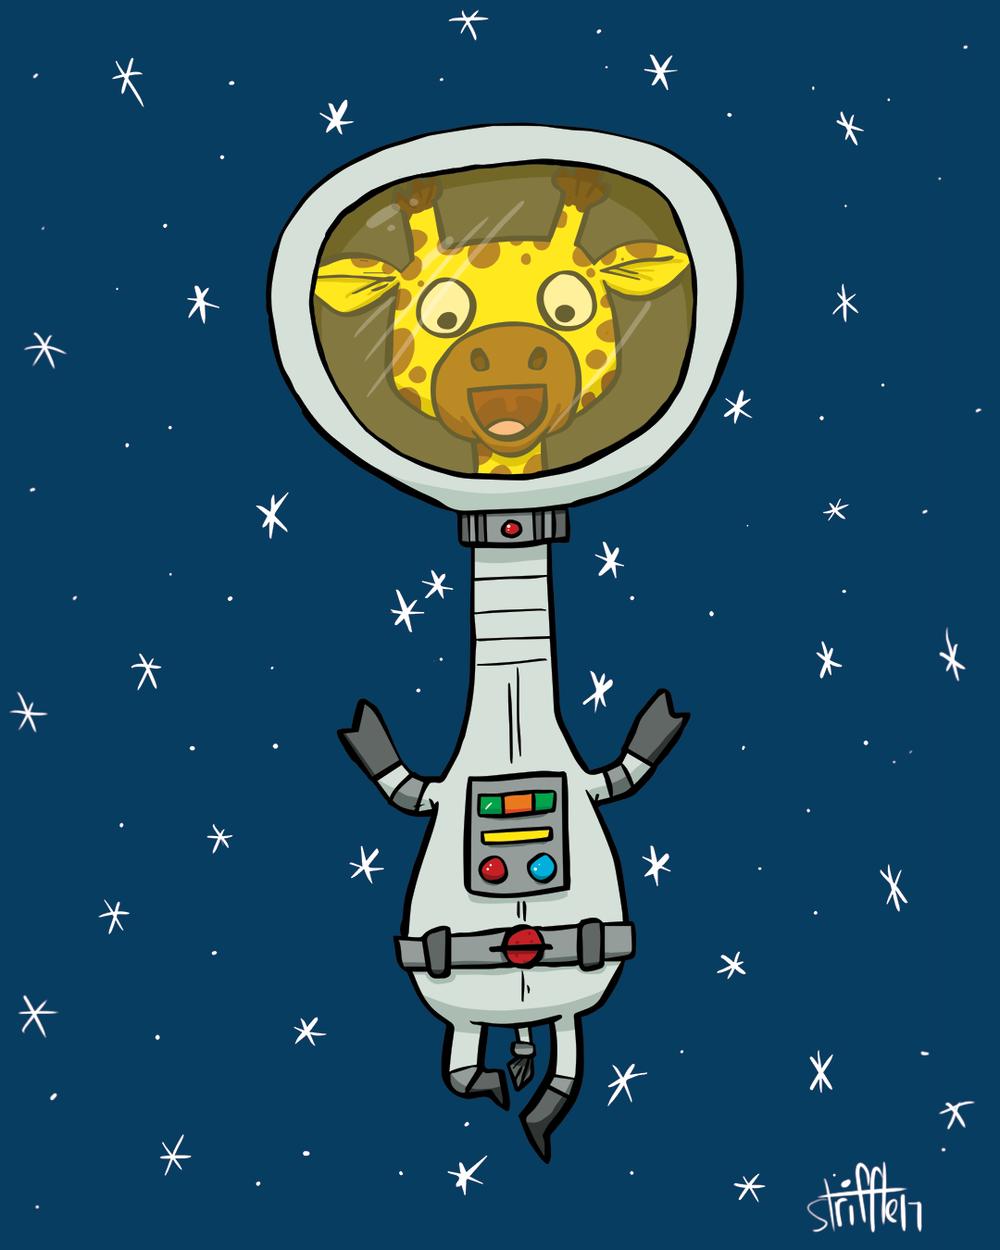 Astro Giraffe